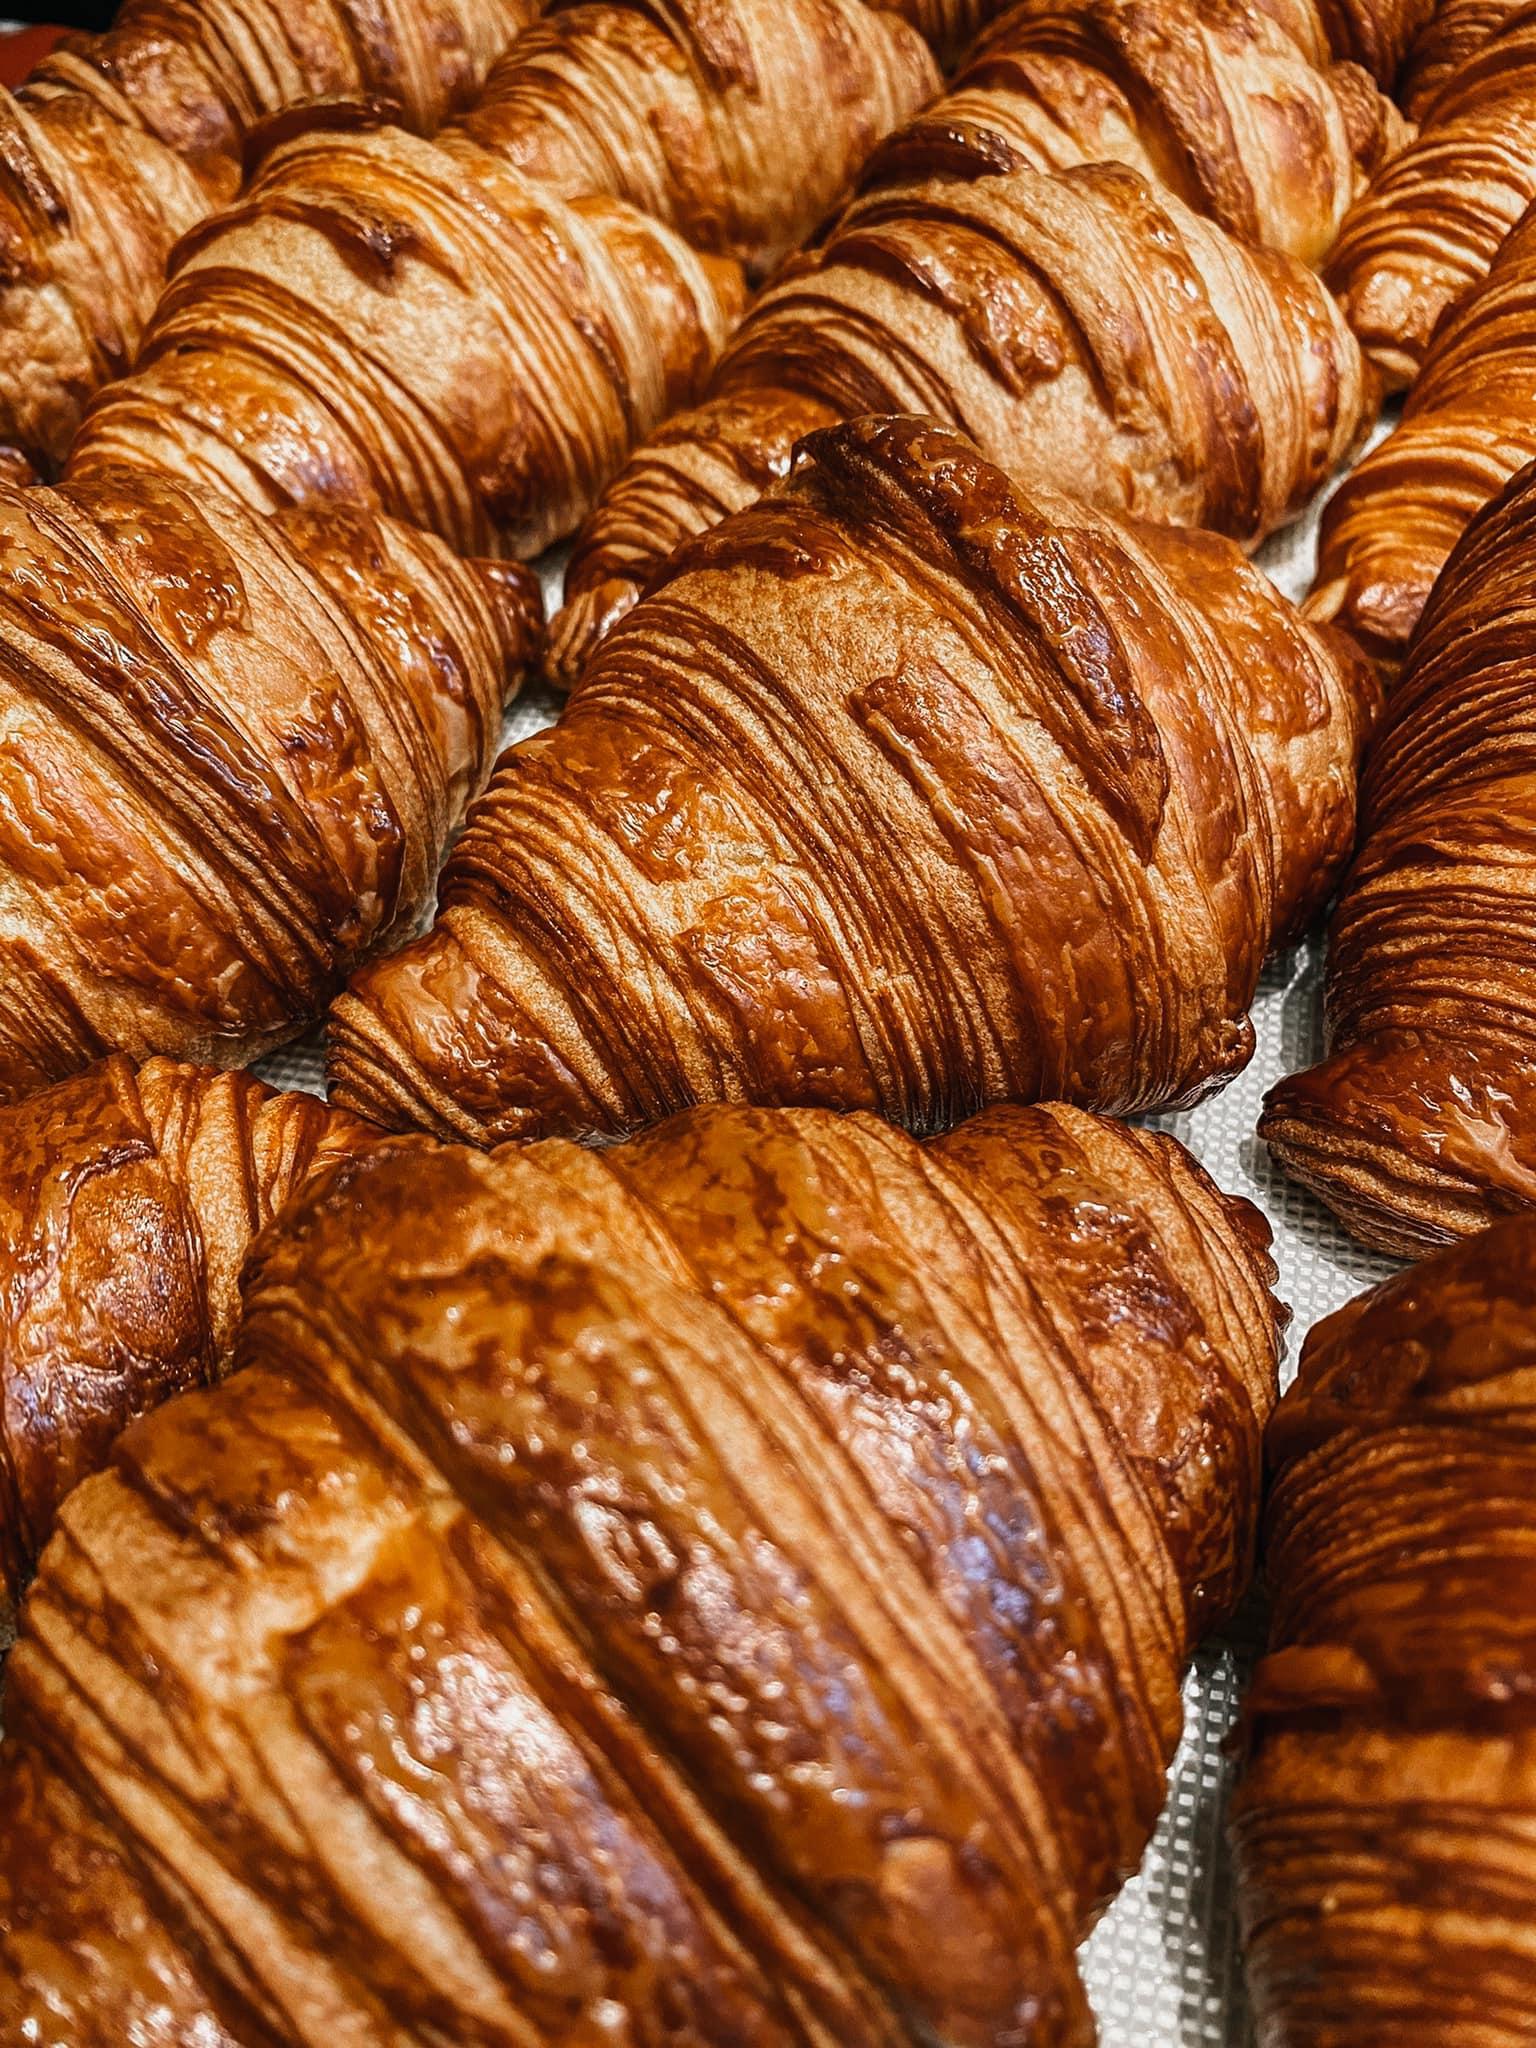 Croissant 2 - แนะนำ 7 ร้านครัวซองต์ กรอบนอกนุ่มใน อร่อยทุกคำที่สัมผัส